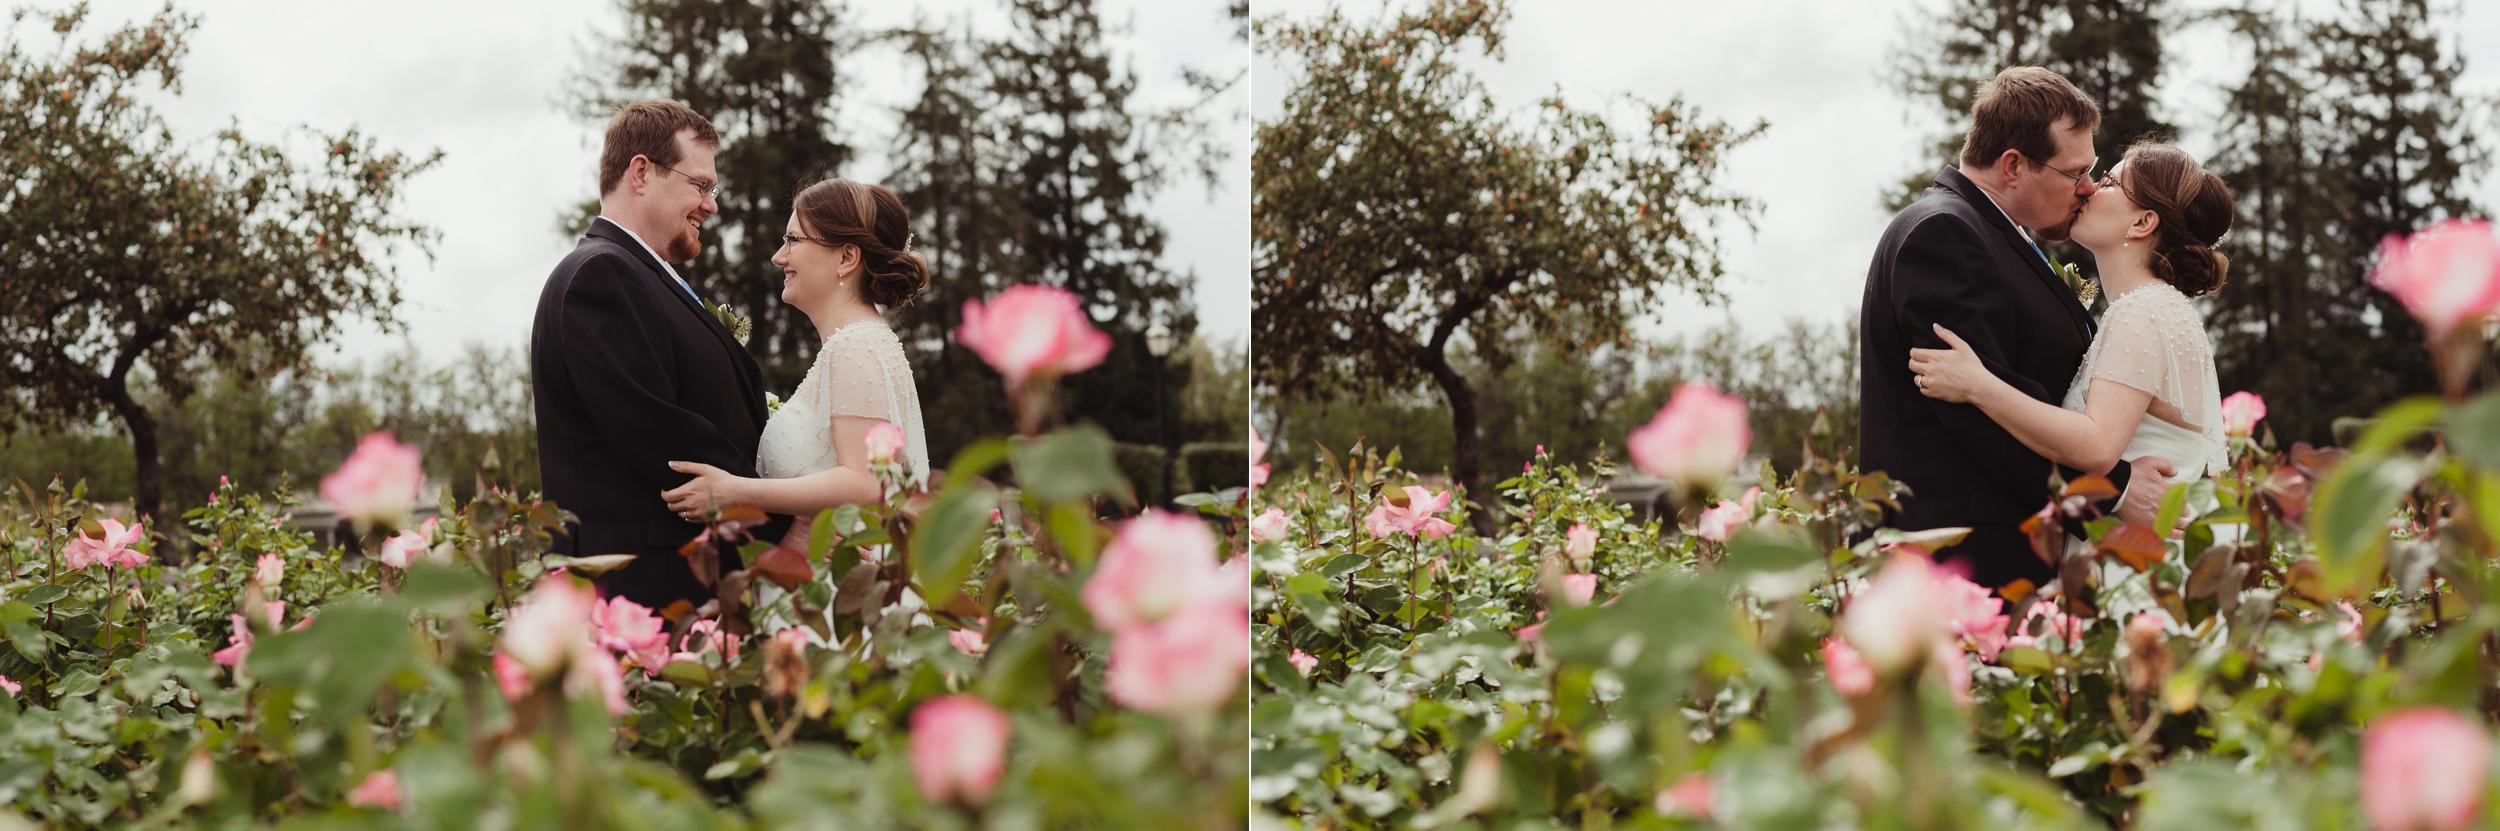 05-san-jose-rose-garden-wedding-vivianchen-098_WEB.jpg